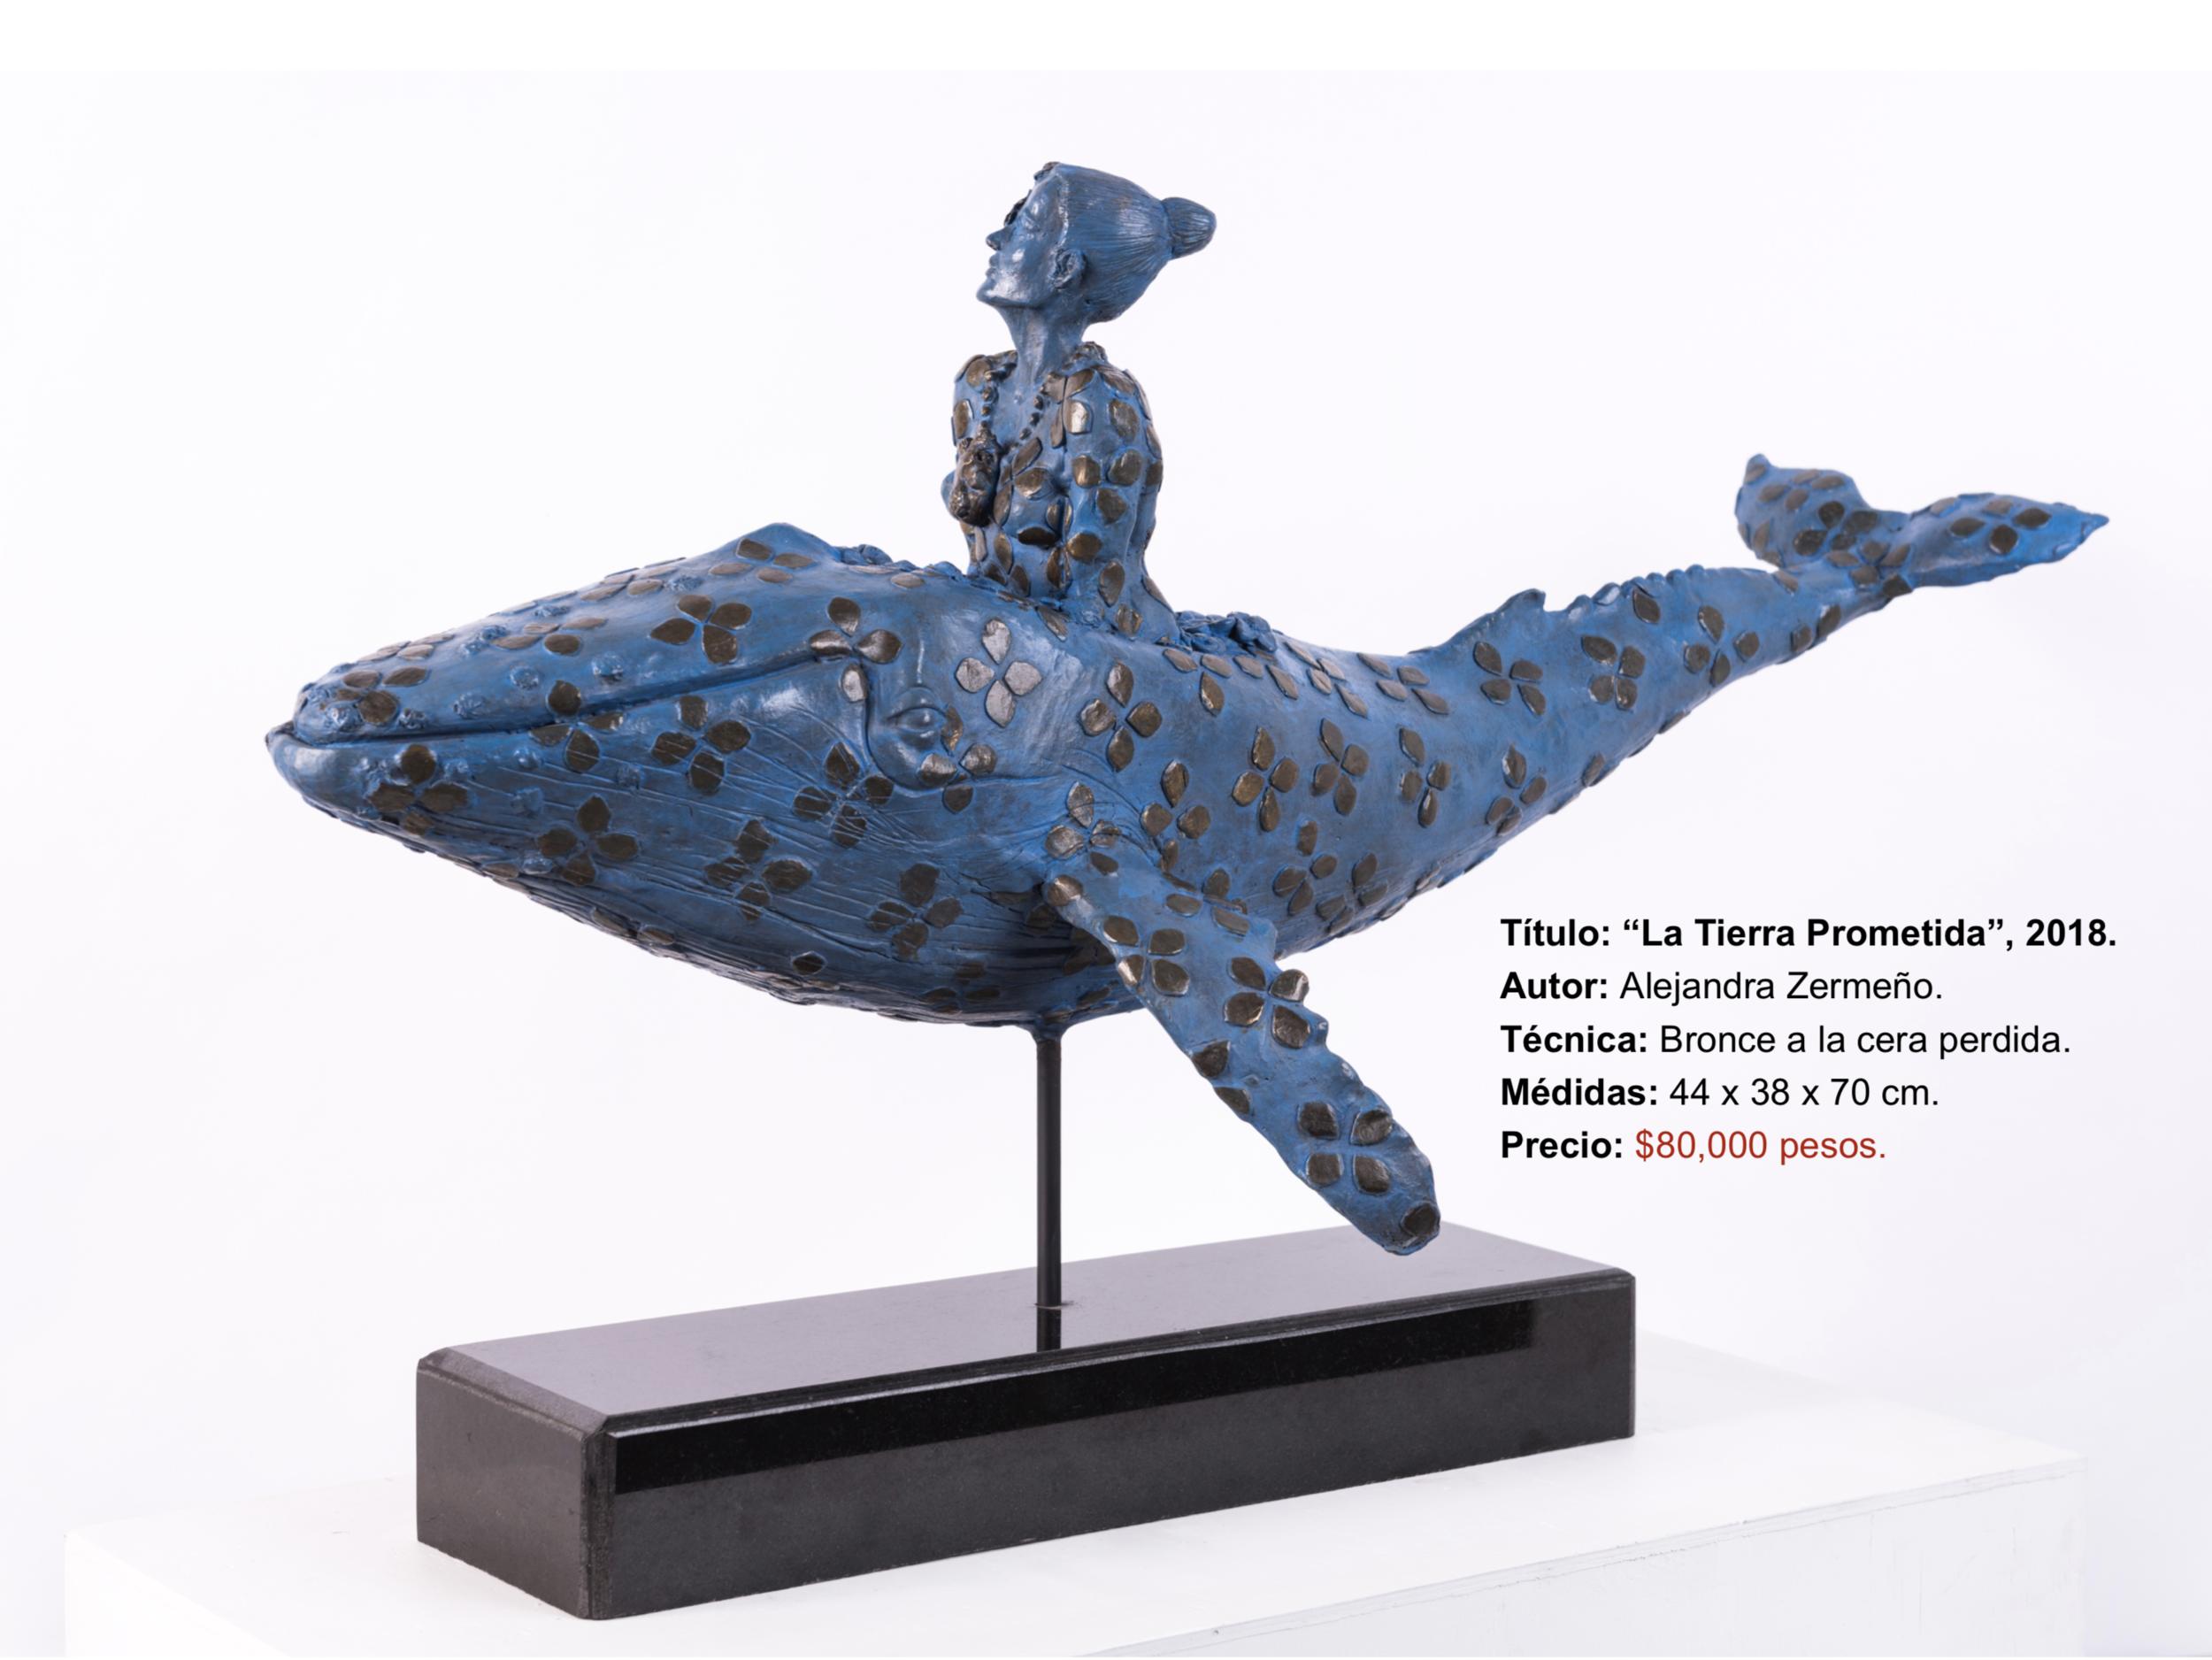 "Título:  ""La Tierra Prometida"", 2018.   Autor:  Alejandra Zermeño.  Técnica:  Bronce a la cera perdida.   Medidas:  44 x 38 x 70 cm."